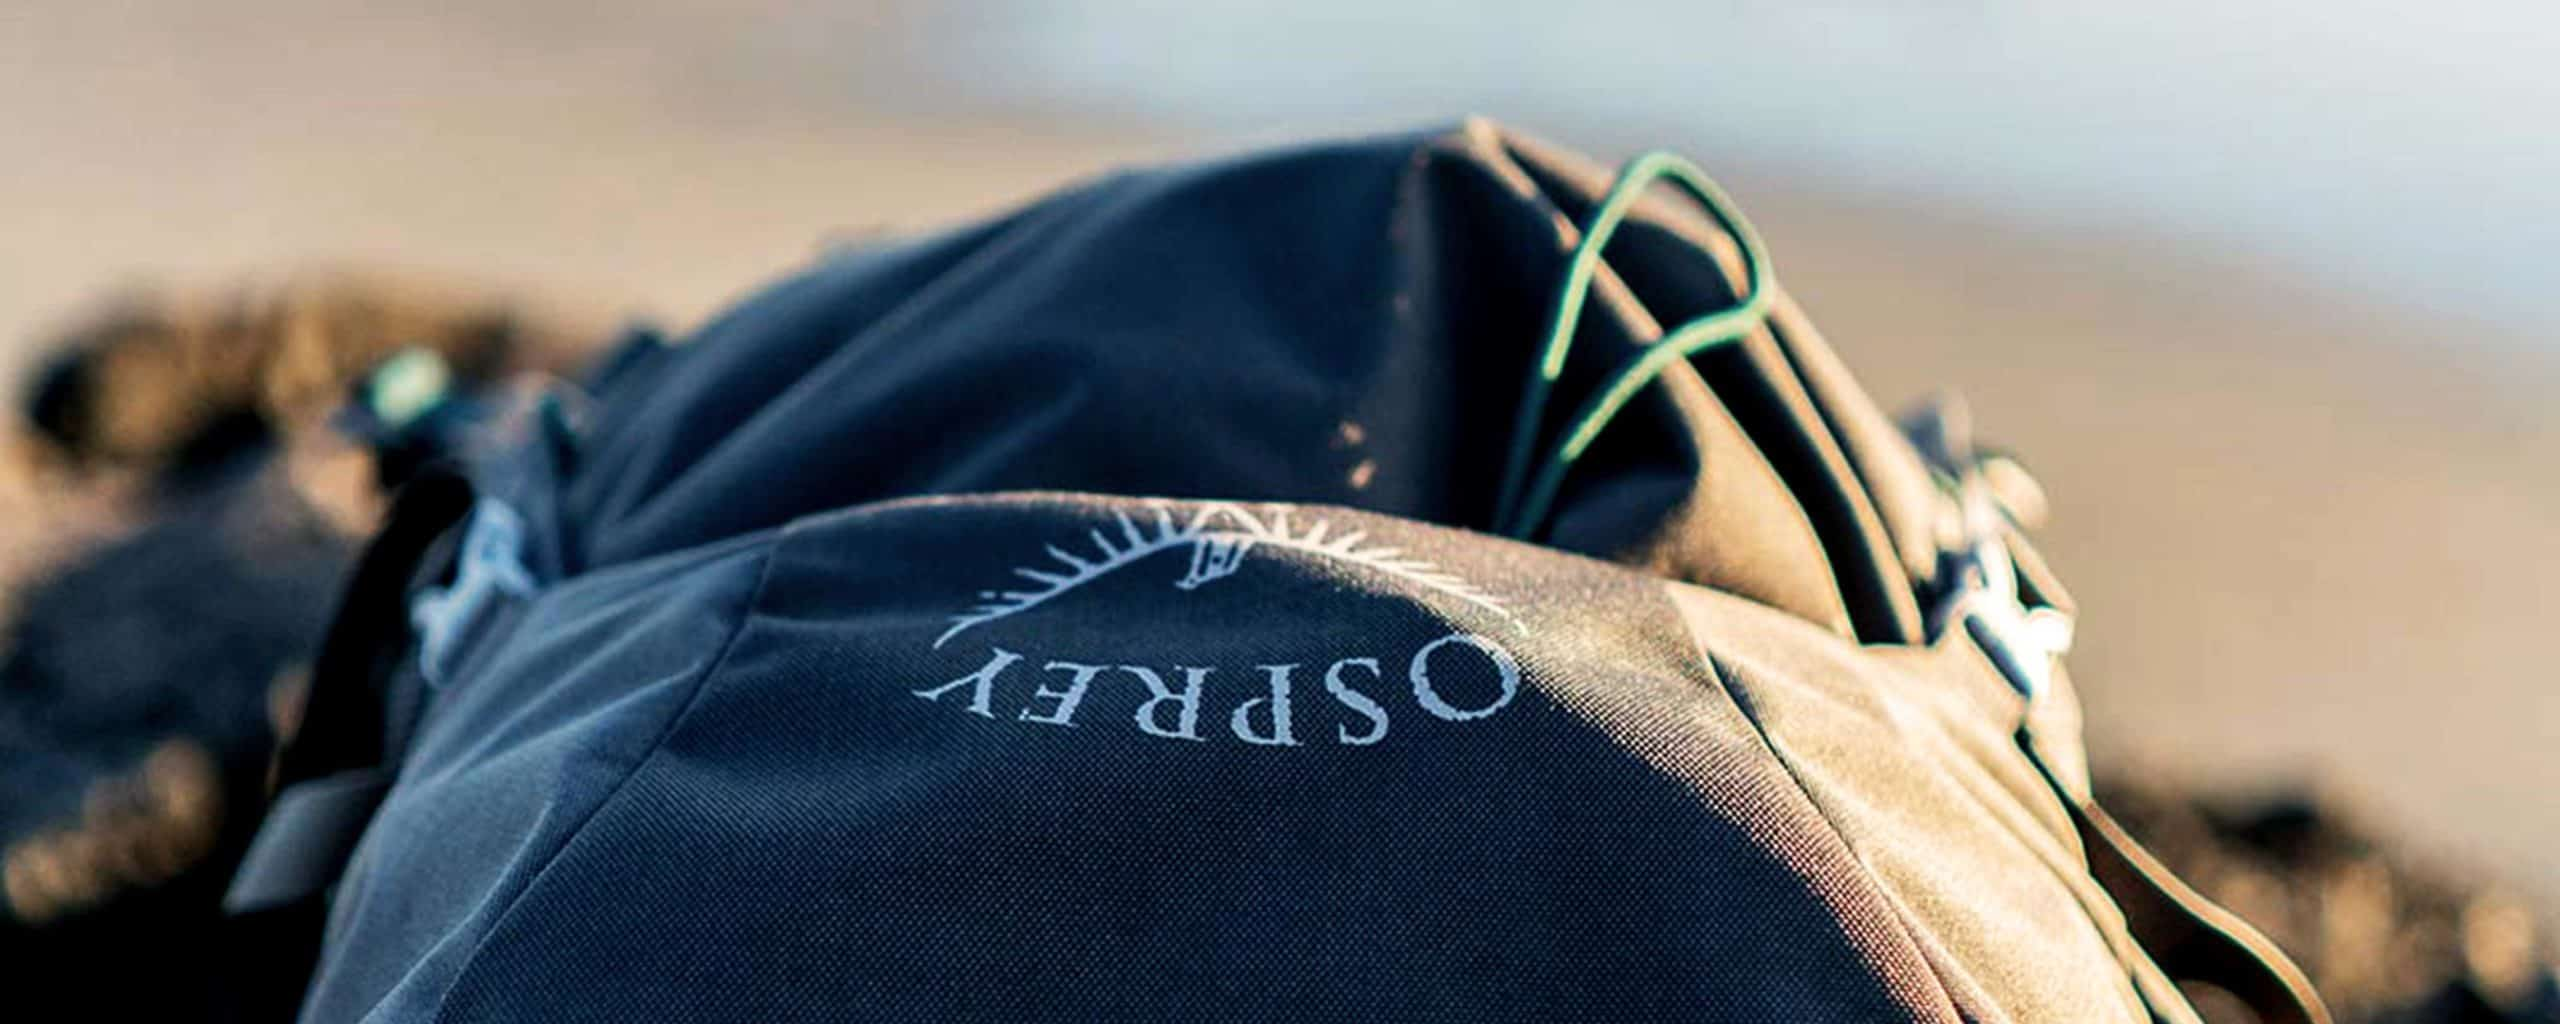 Revue du sac à dos Renn 50 par Osprey